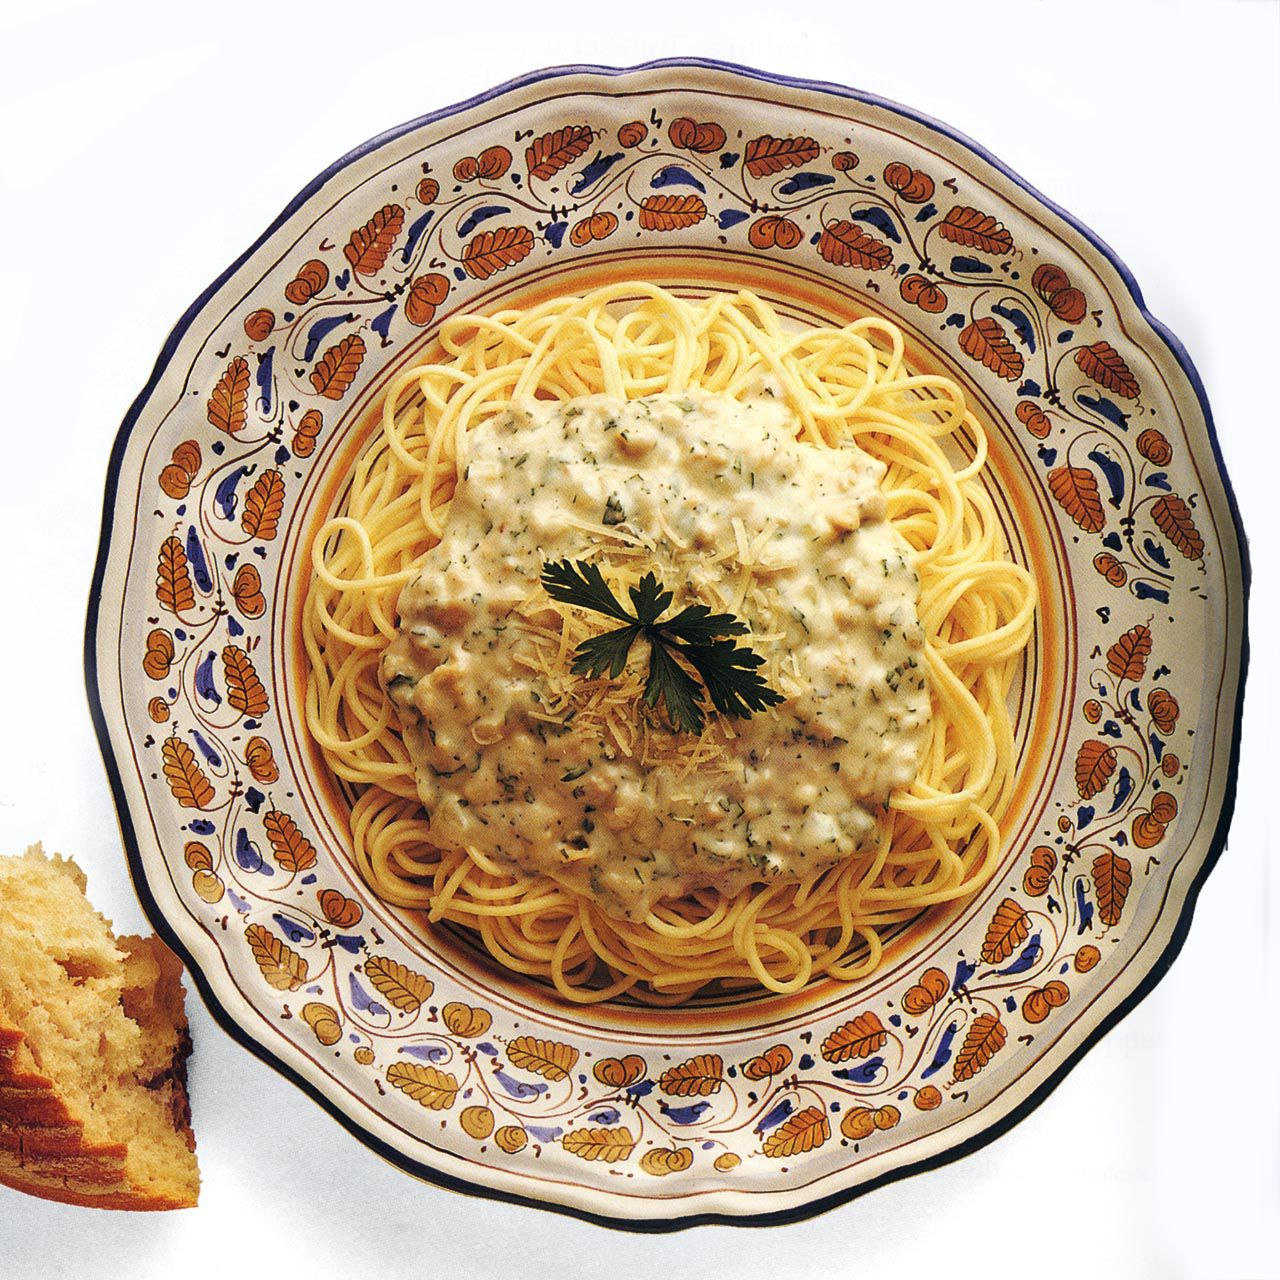 Spaghetti with Creamy Clam Sauce